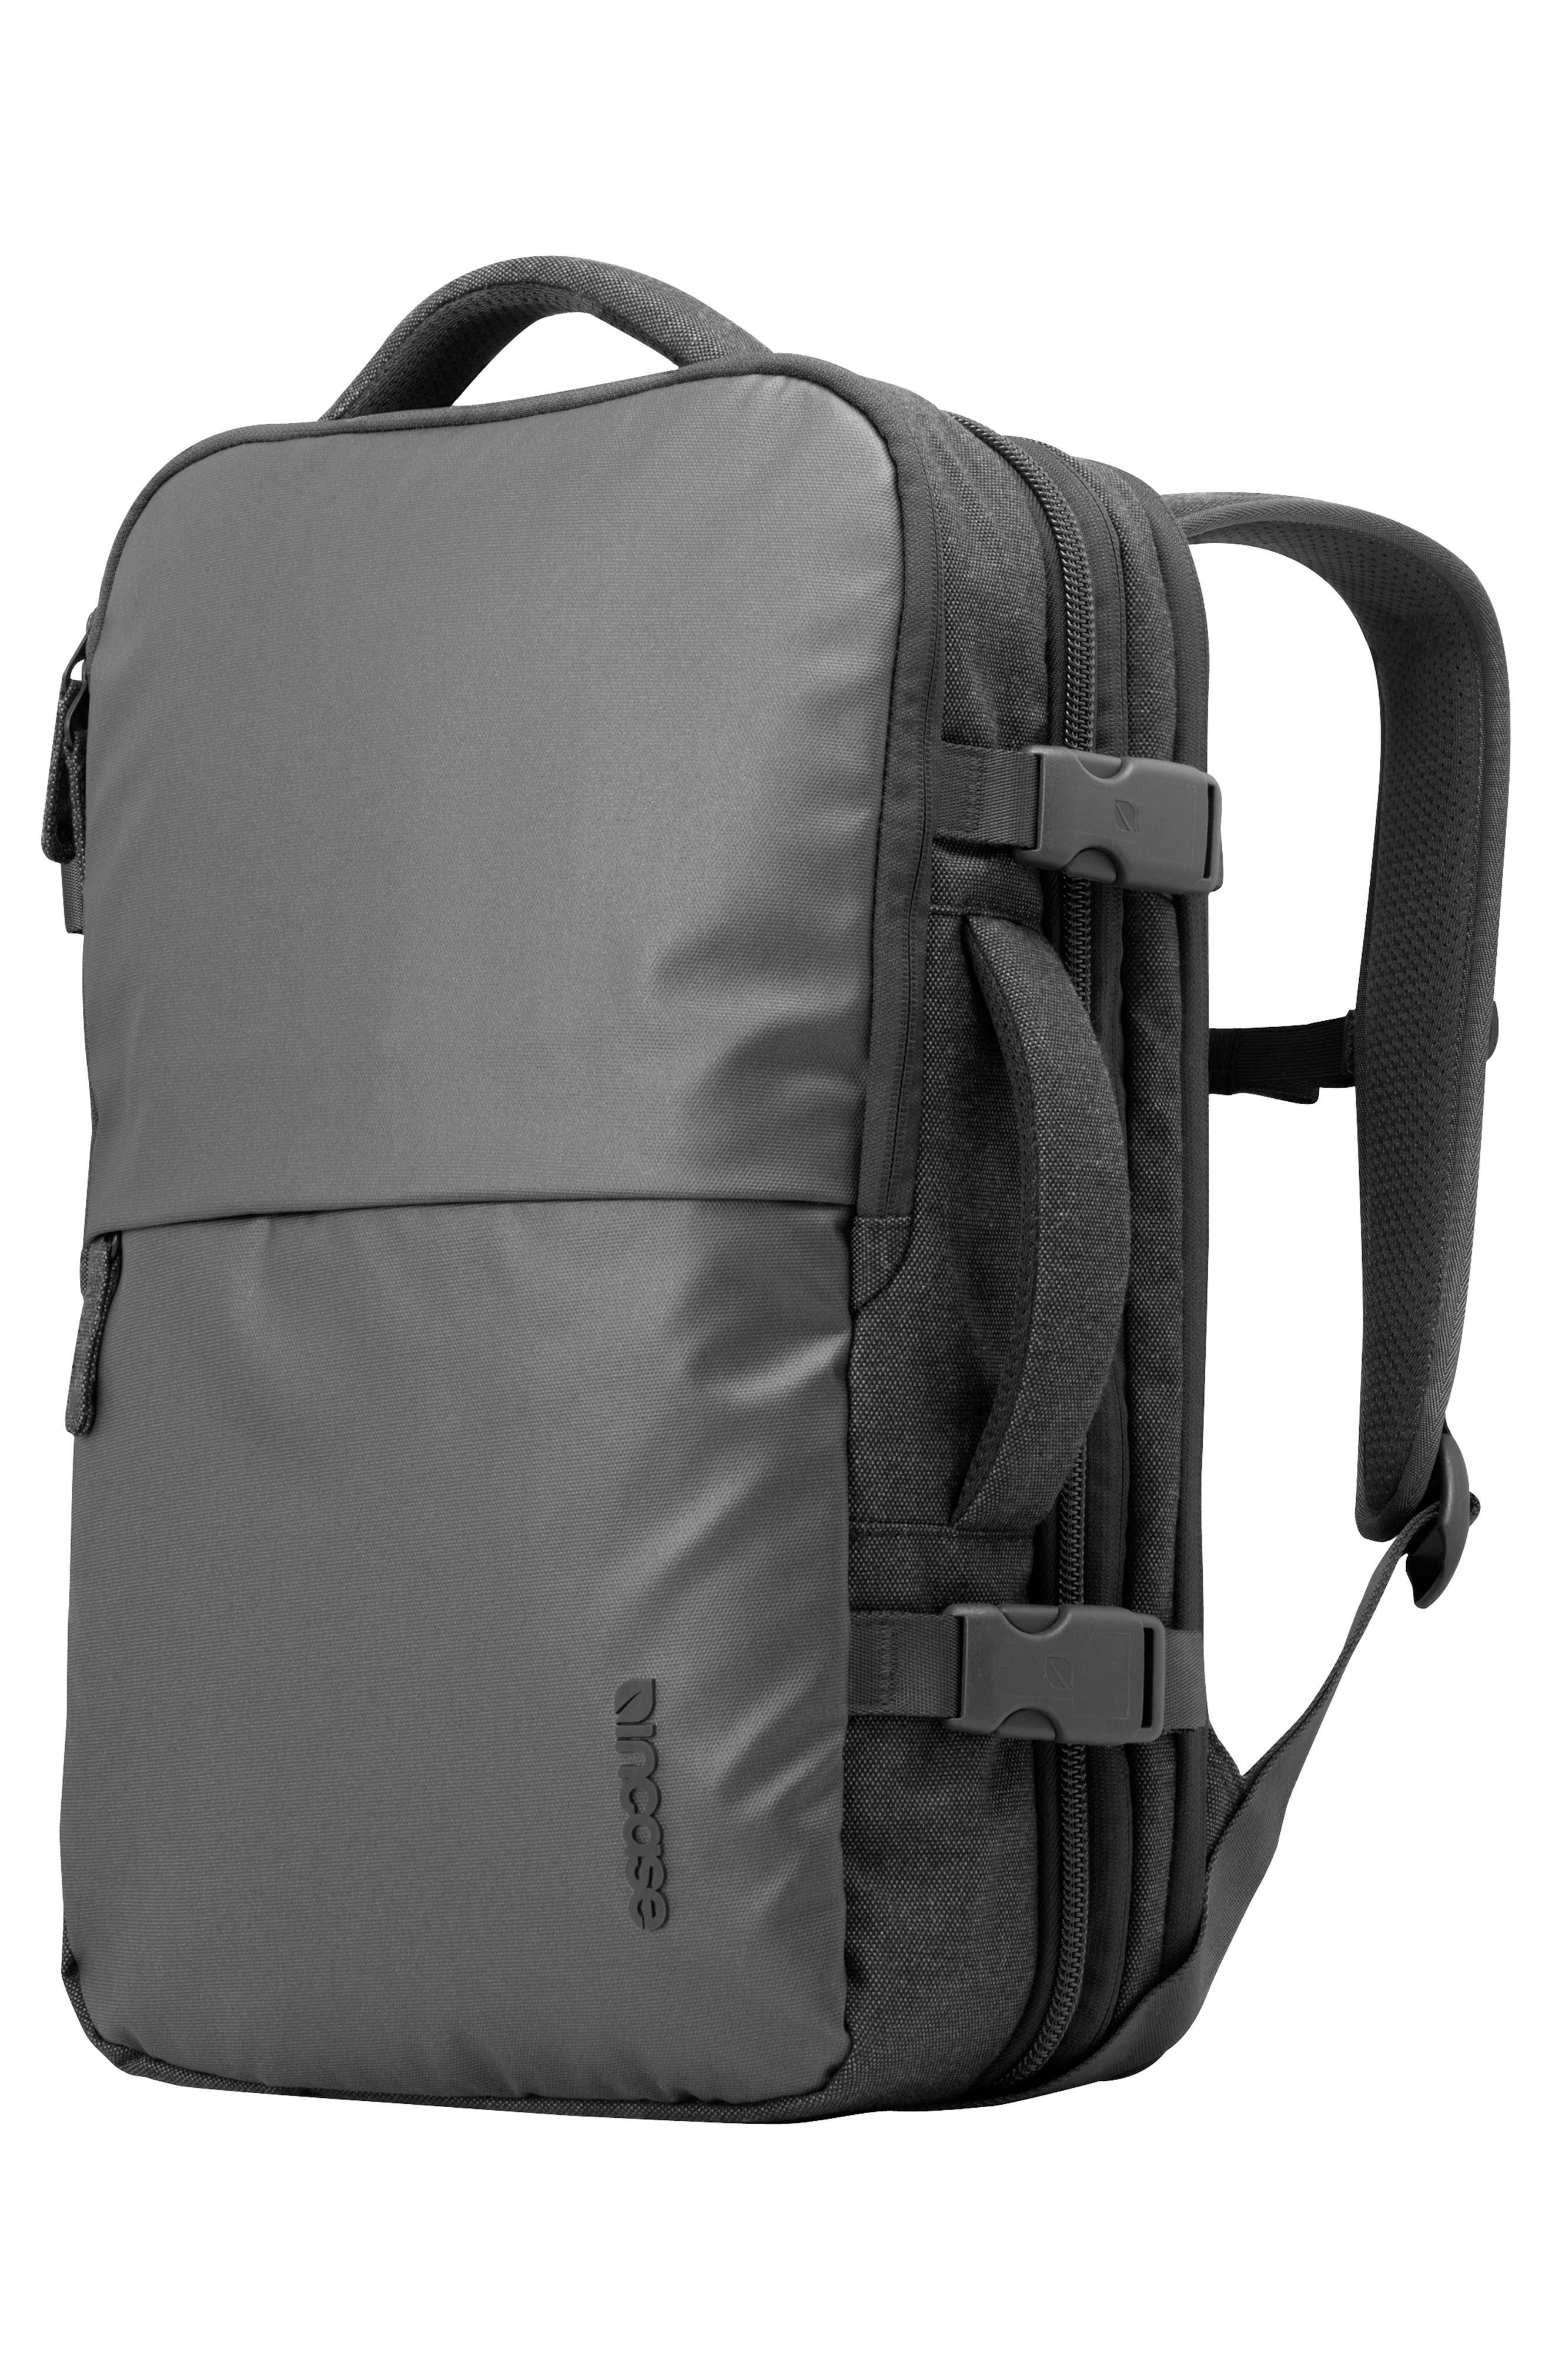 EO Travel Backpack,                             Alternate thumbnail 2, color,                             001